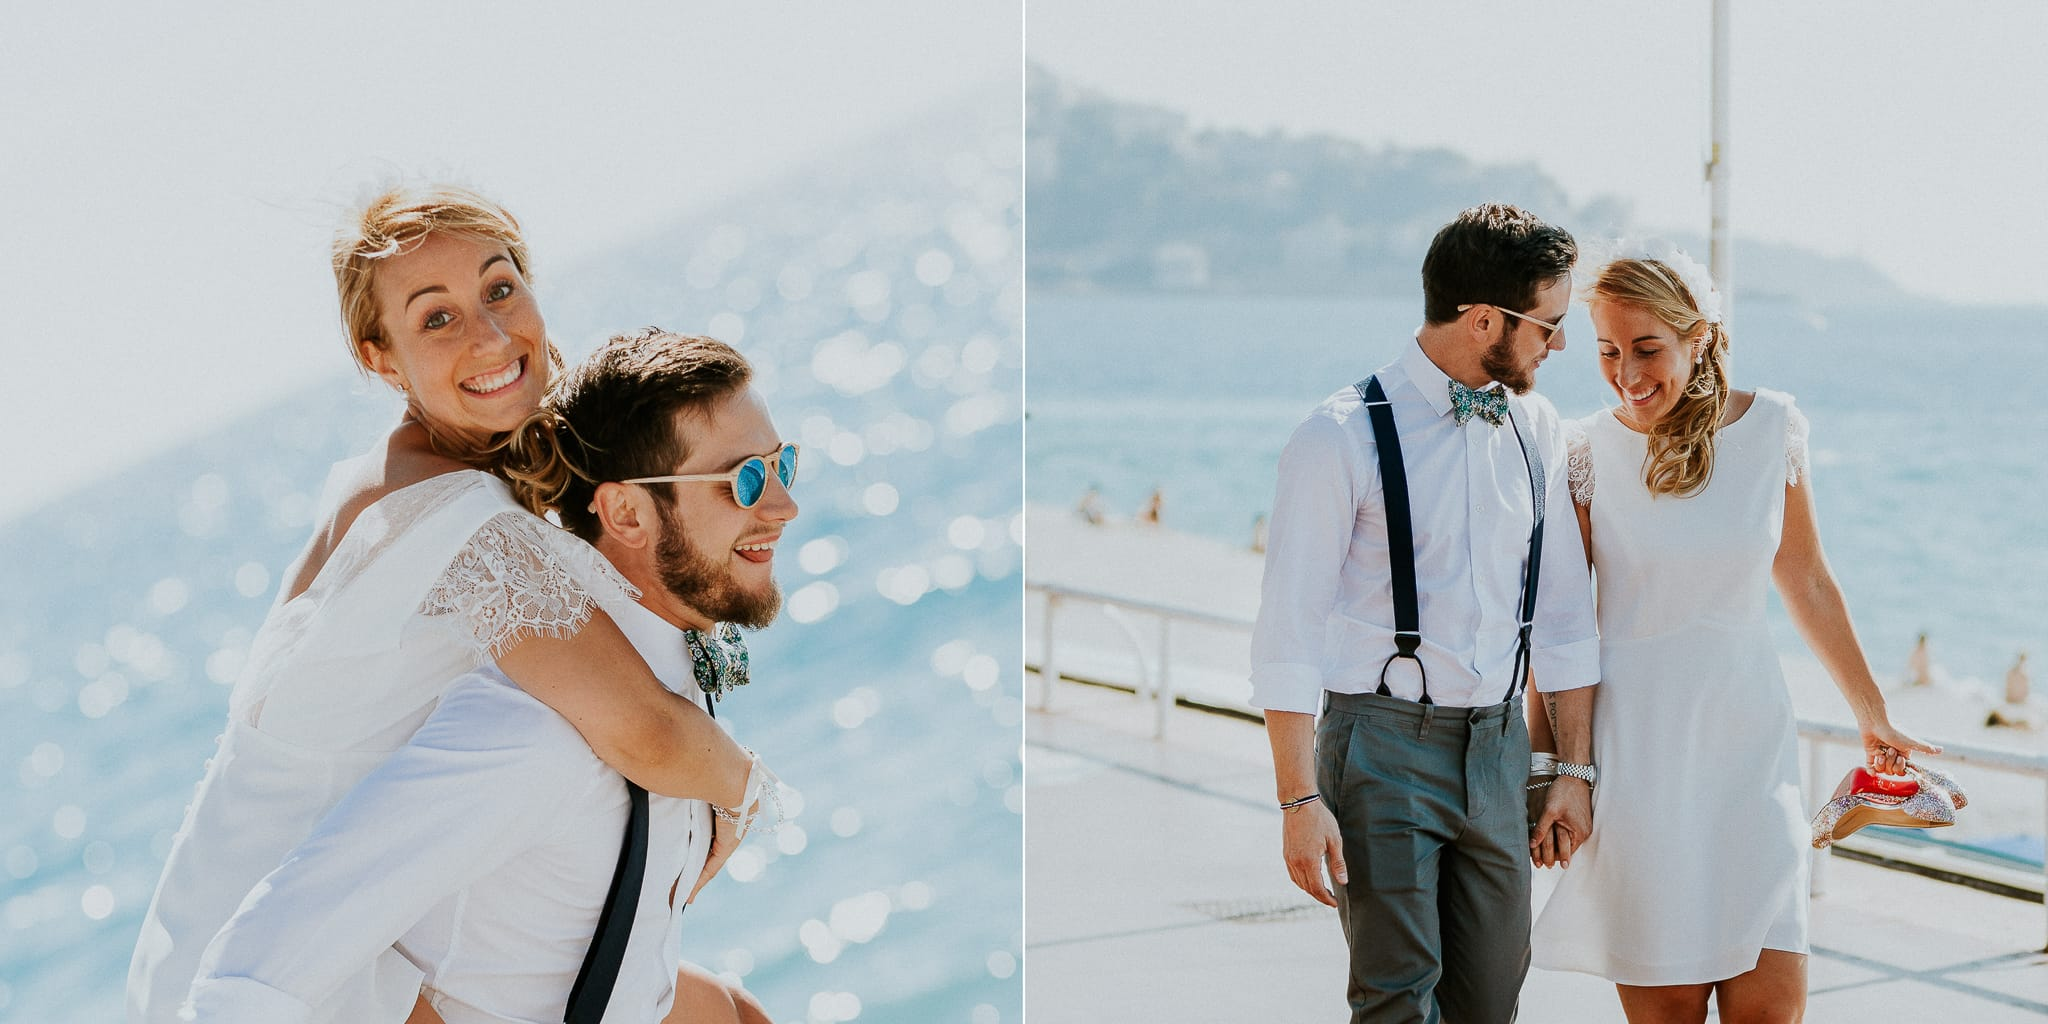 Costi-Moiceanu-Photographer-CM-Photography-Wedding-Mariage-French-Riviera-Cote-D-Azur-Alpes-Maritimes-Weding-Album-Design-4